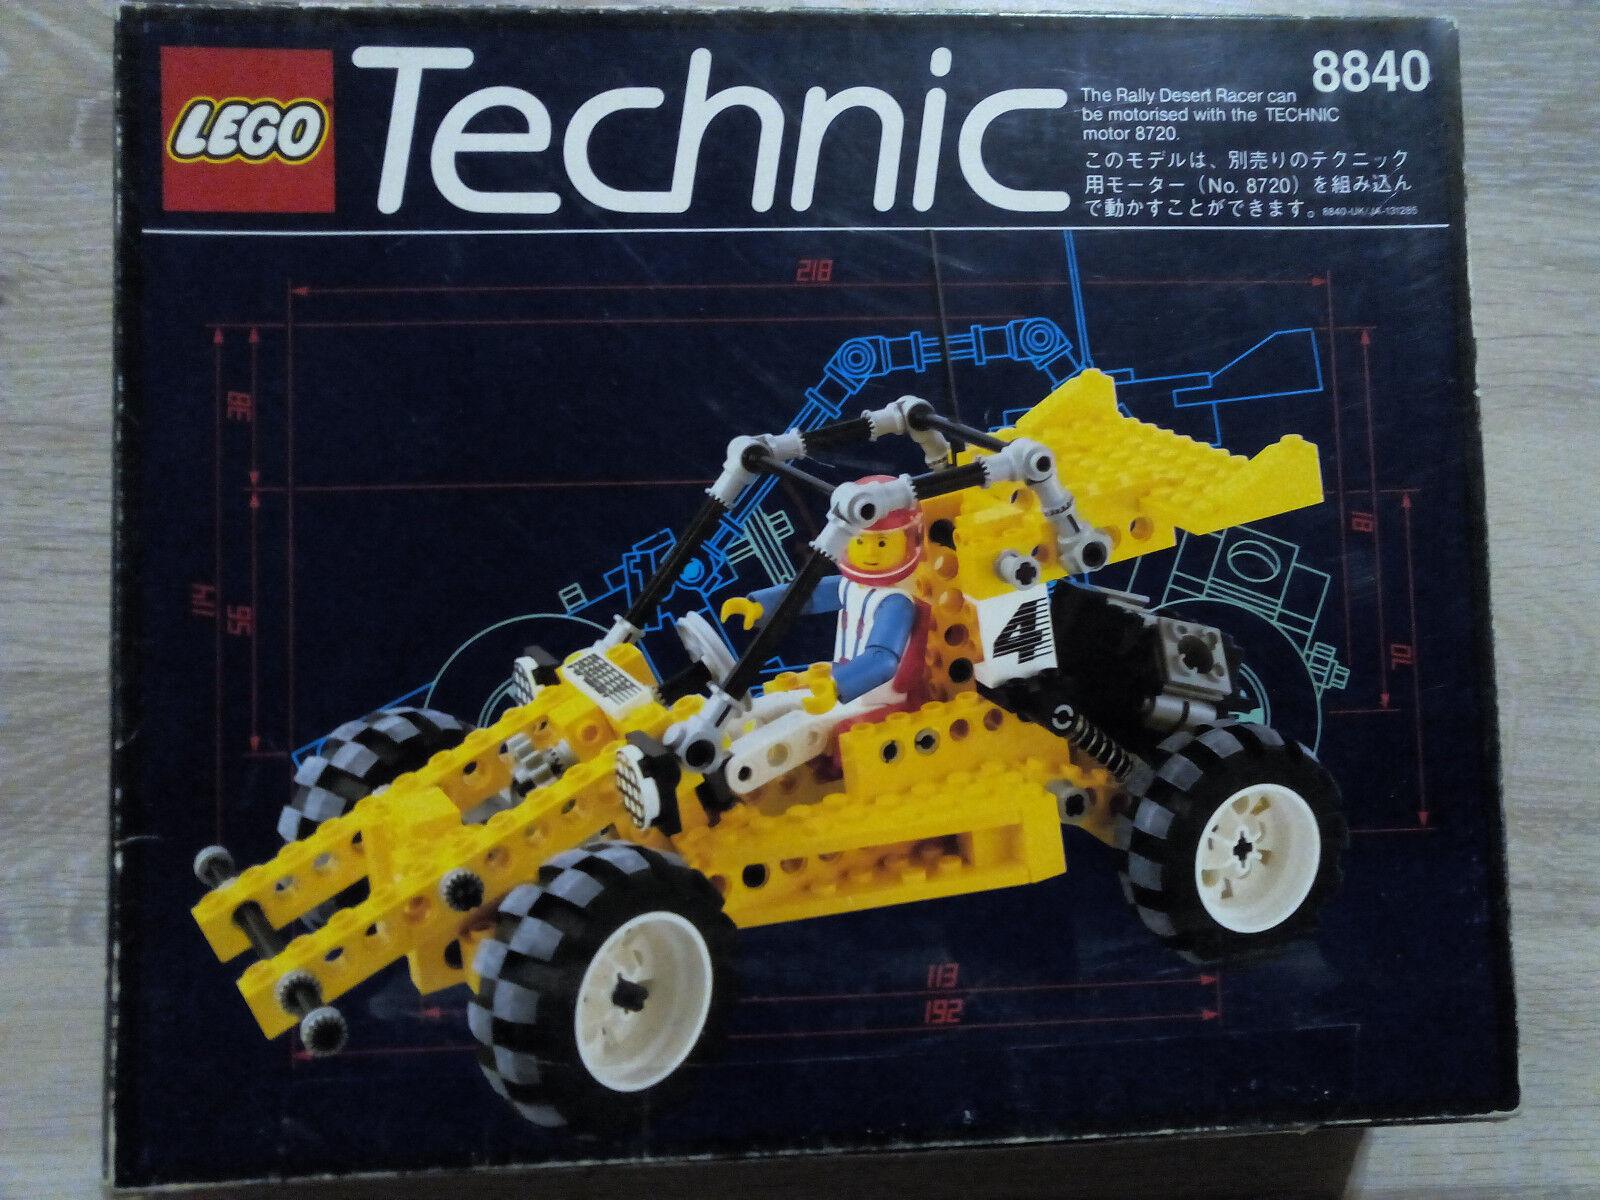 Lego Technic Technik 8840 Rallye Shock & Roll Racer   TOP ZUSTAND - RARITÄT